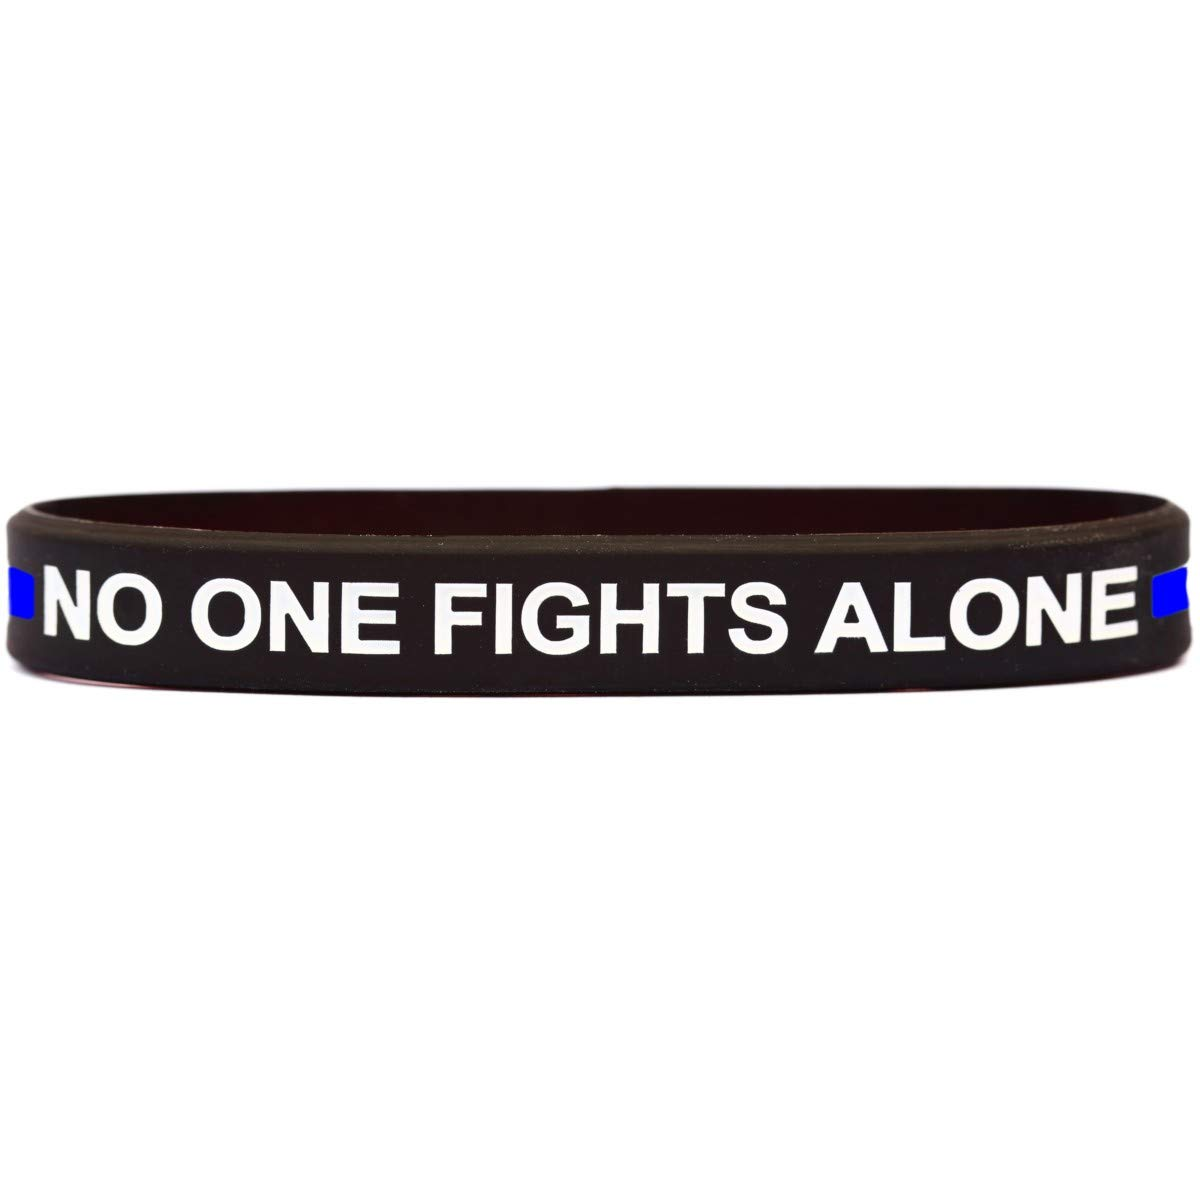 SayitBands 10 of Thin Blue Line No One Fights Alone Bracelets